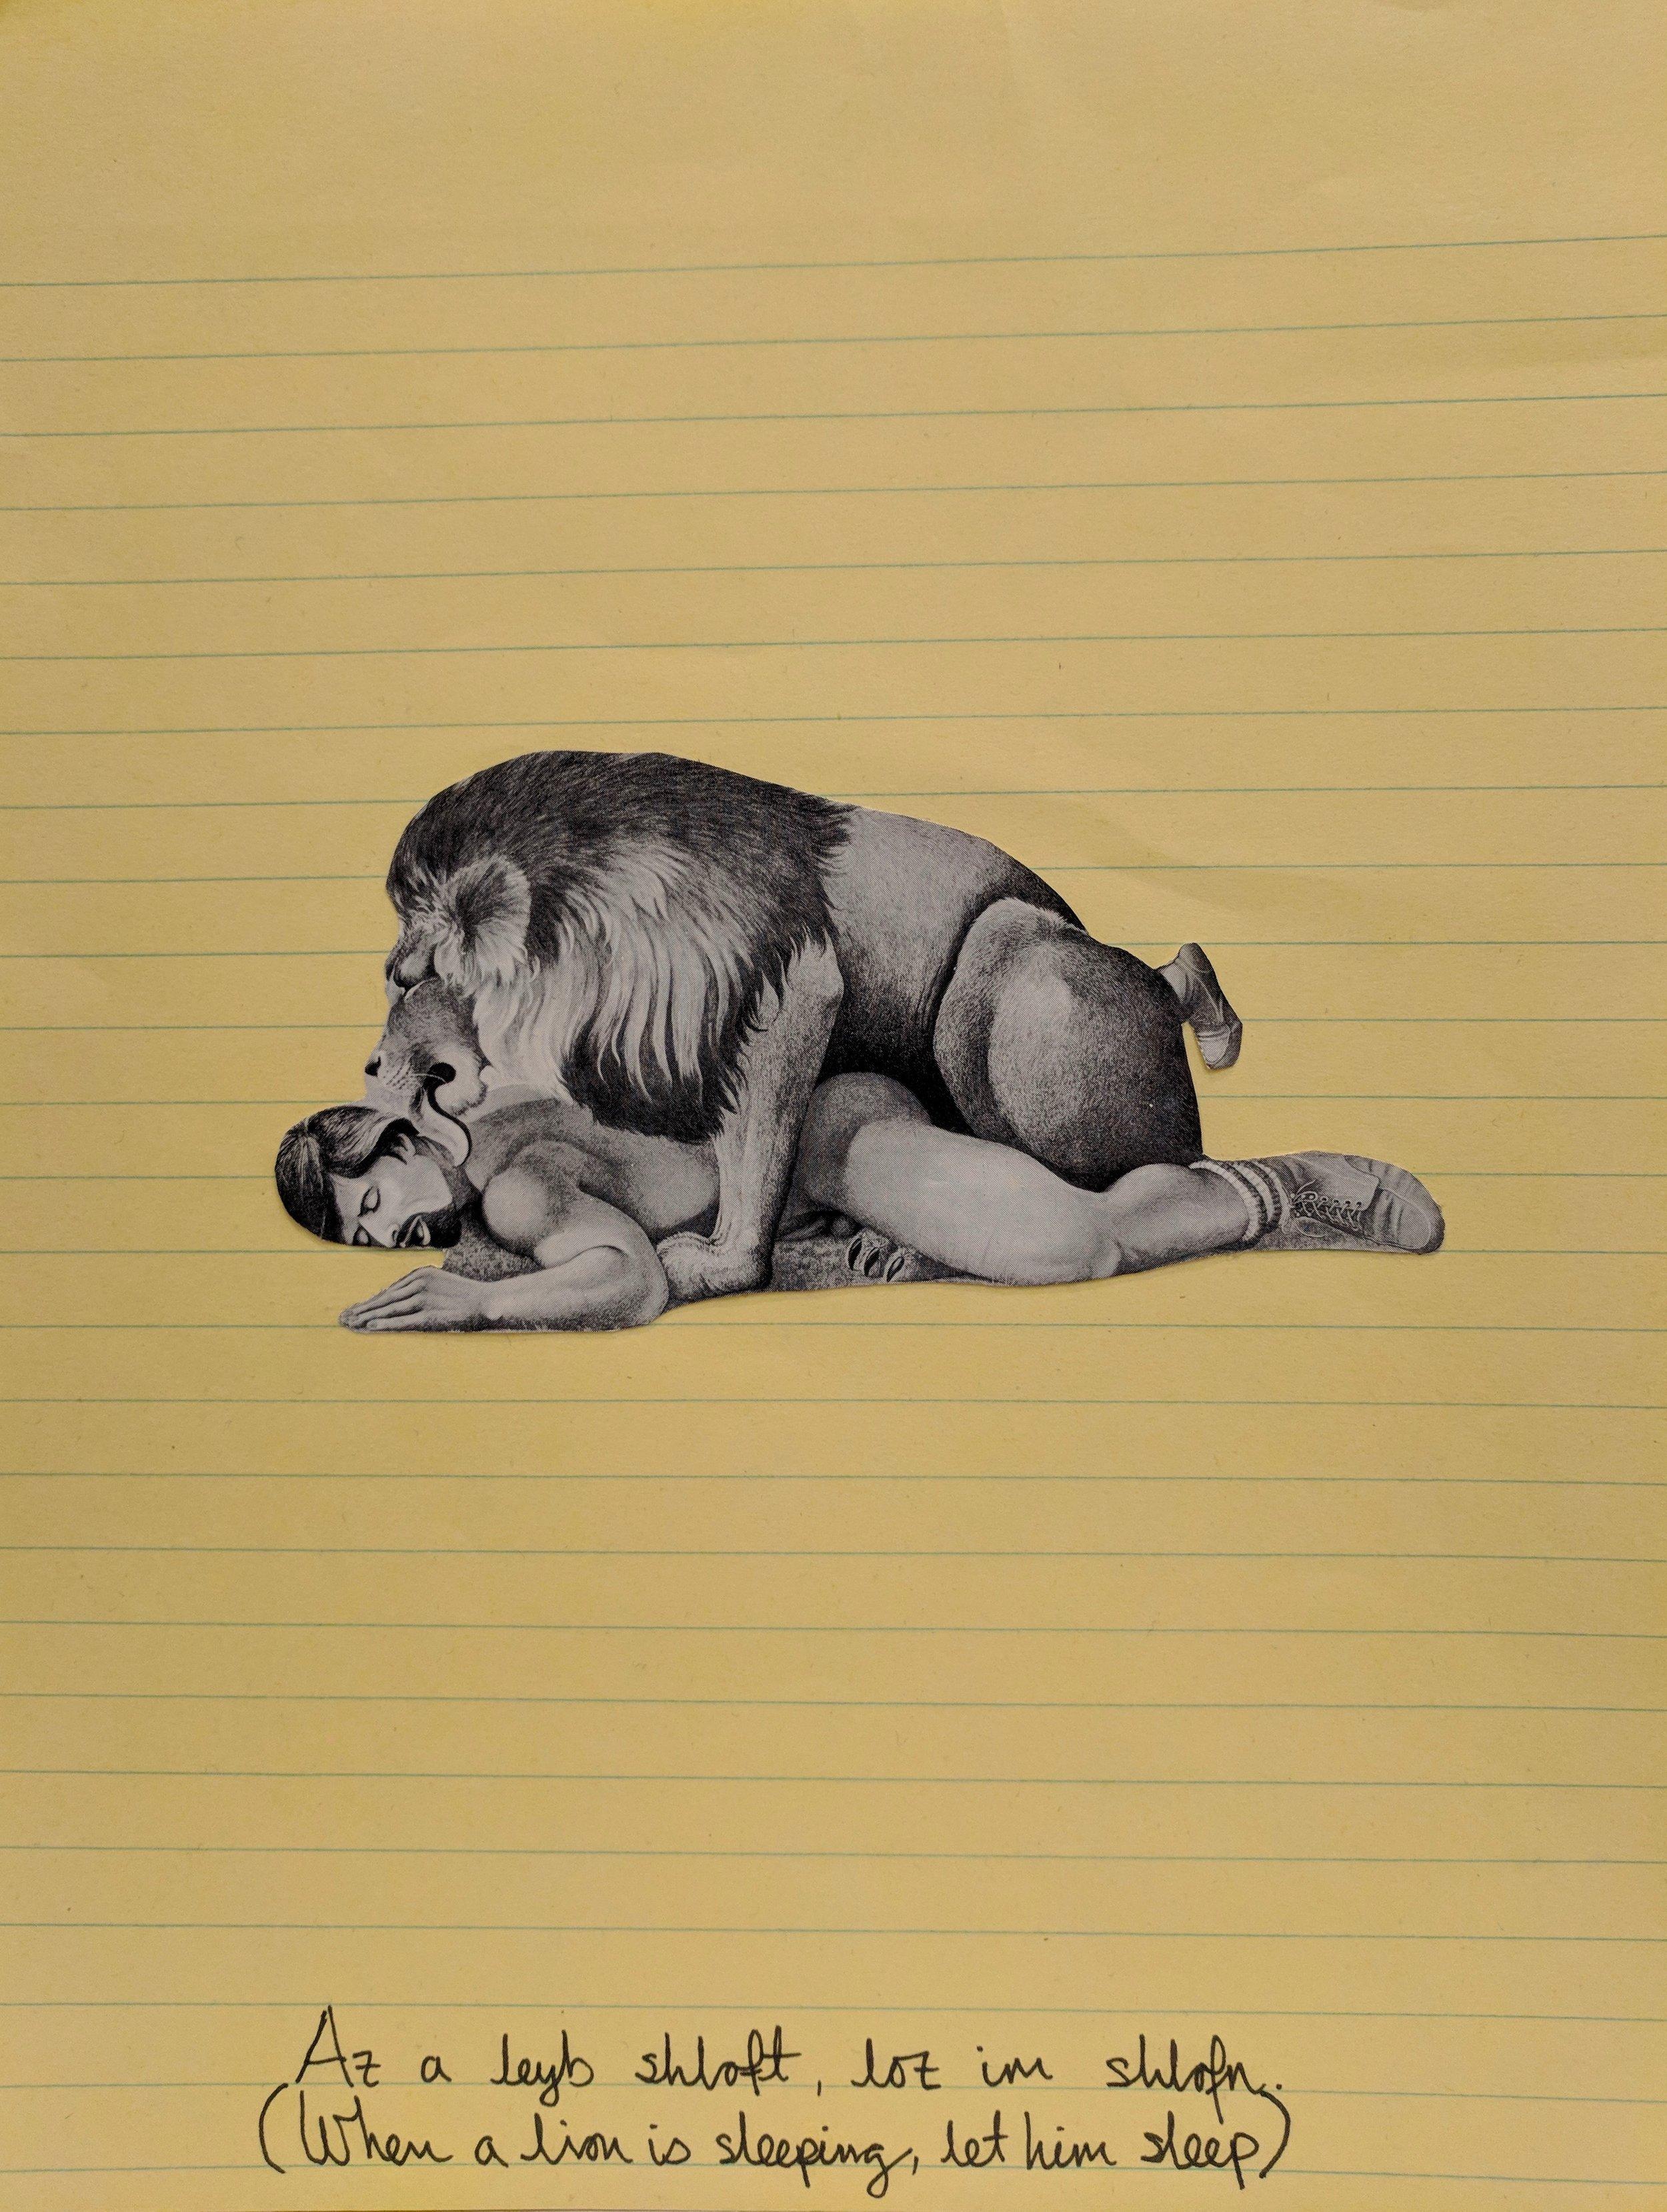 Az a leyb shloft, loz im shlofn (When a lion is sleeping, let him sleep)